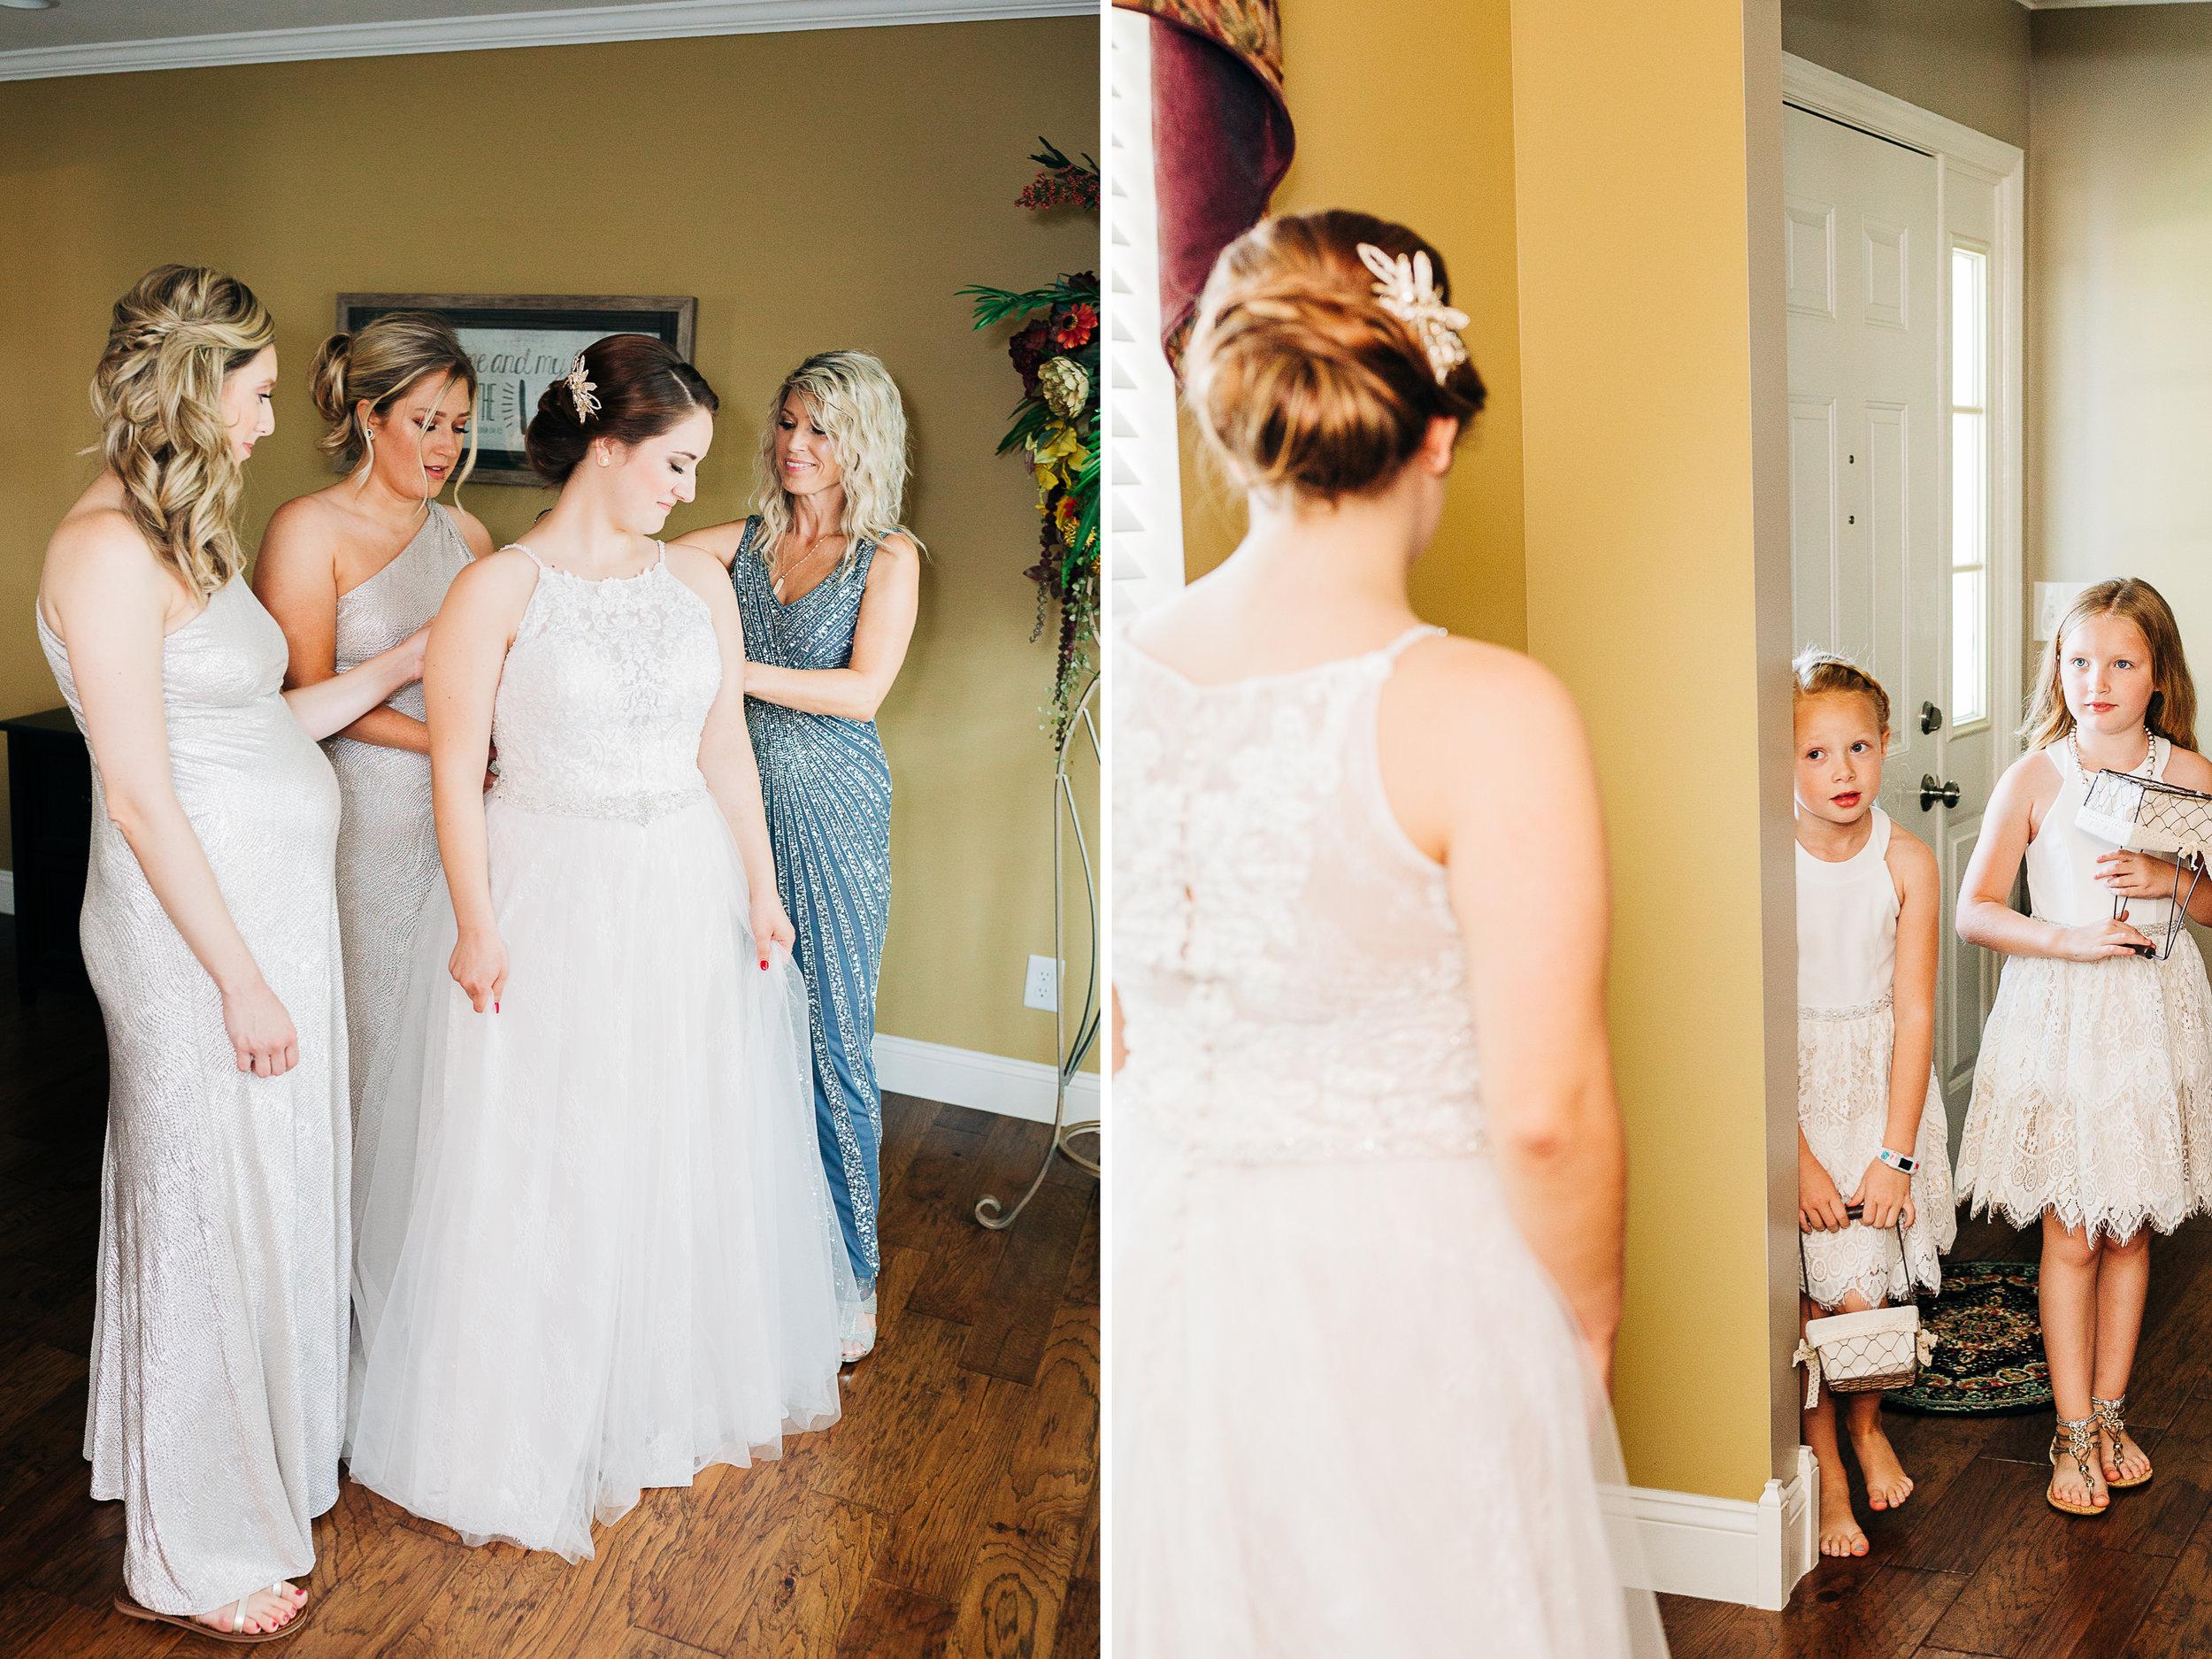 Dorothy_Louise_Photography_Eric_Fallon_La-Belle_Coeur_Main_Street_St_Charles_Wedding_Collage14.jpg